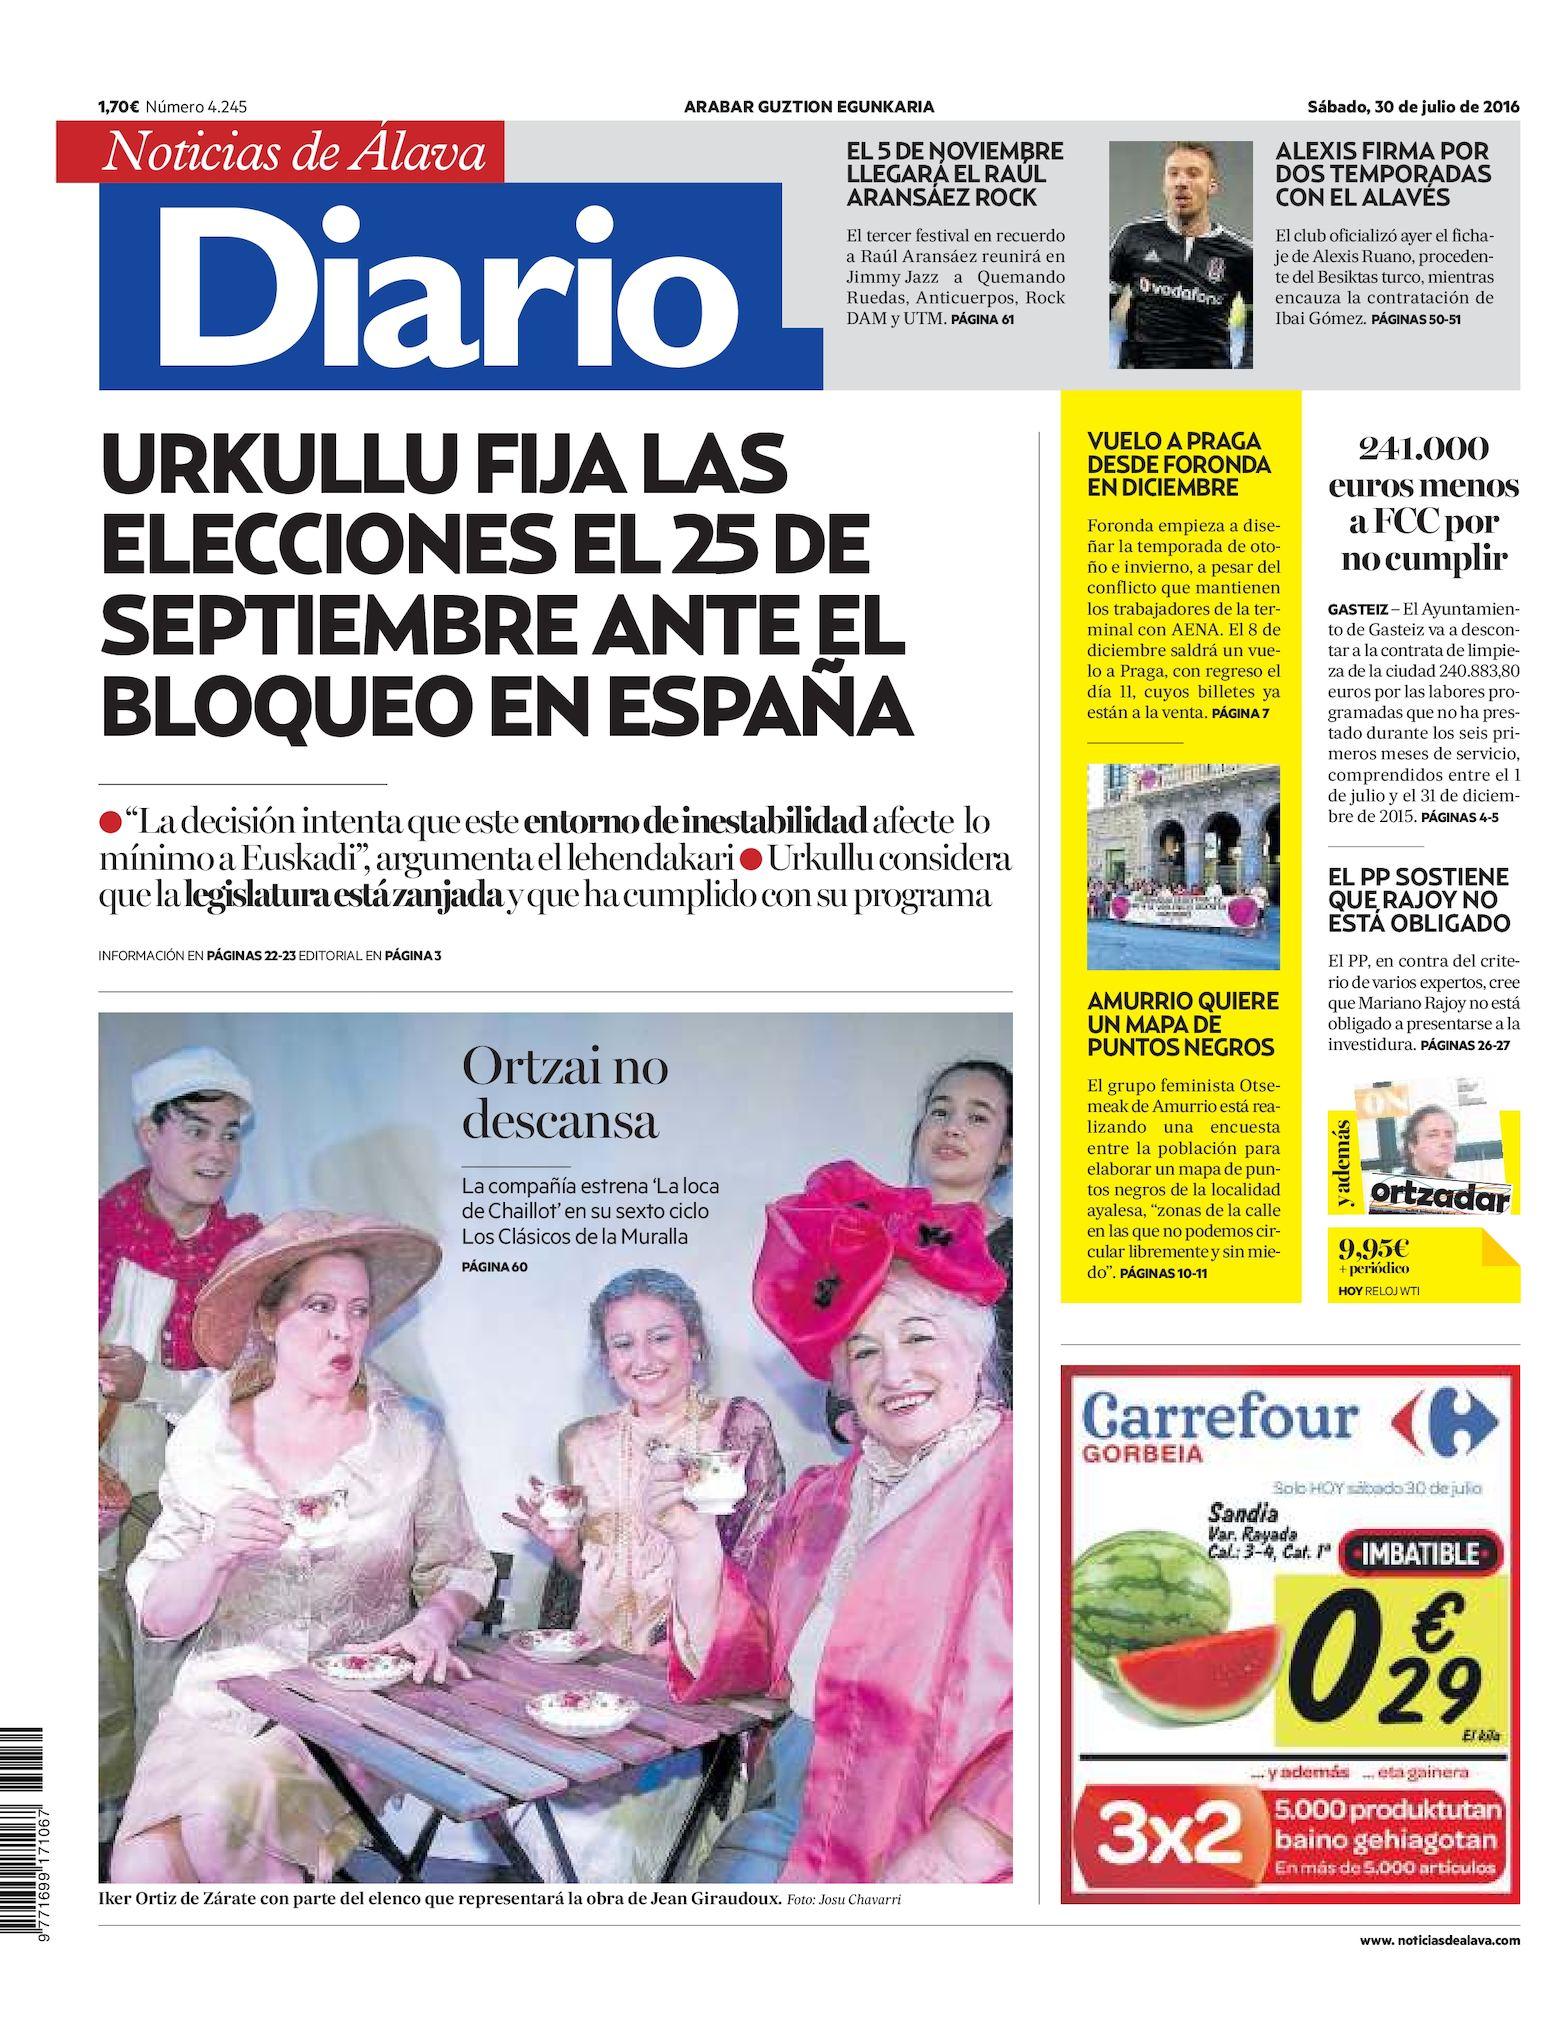 De Noticias Diario Calaméo Álava 20160730 SLqMzUVpG